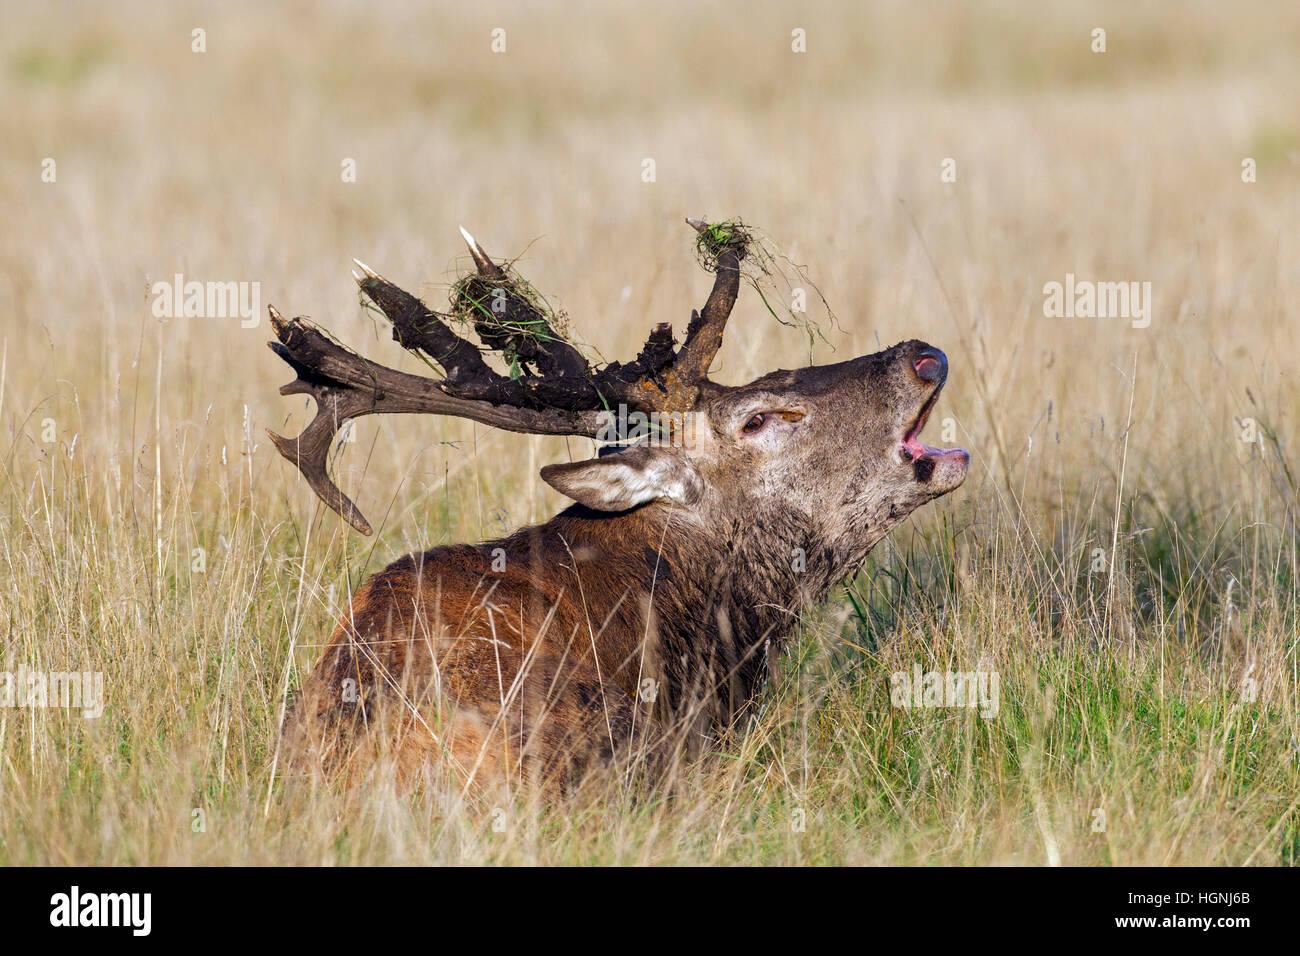 Red deer (Cervus elaphus) stag with broken antlers bellowing during the rut in autumn - Stock Image